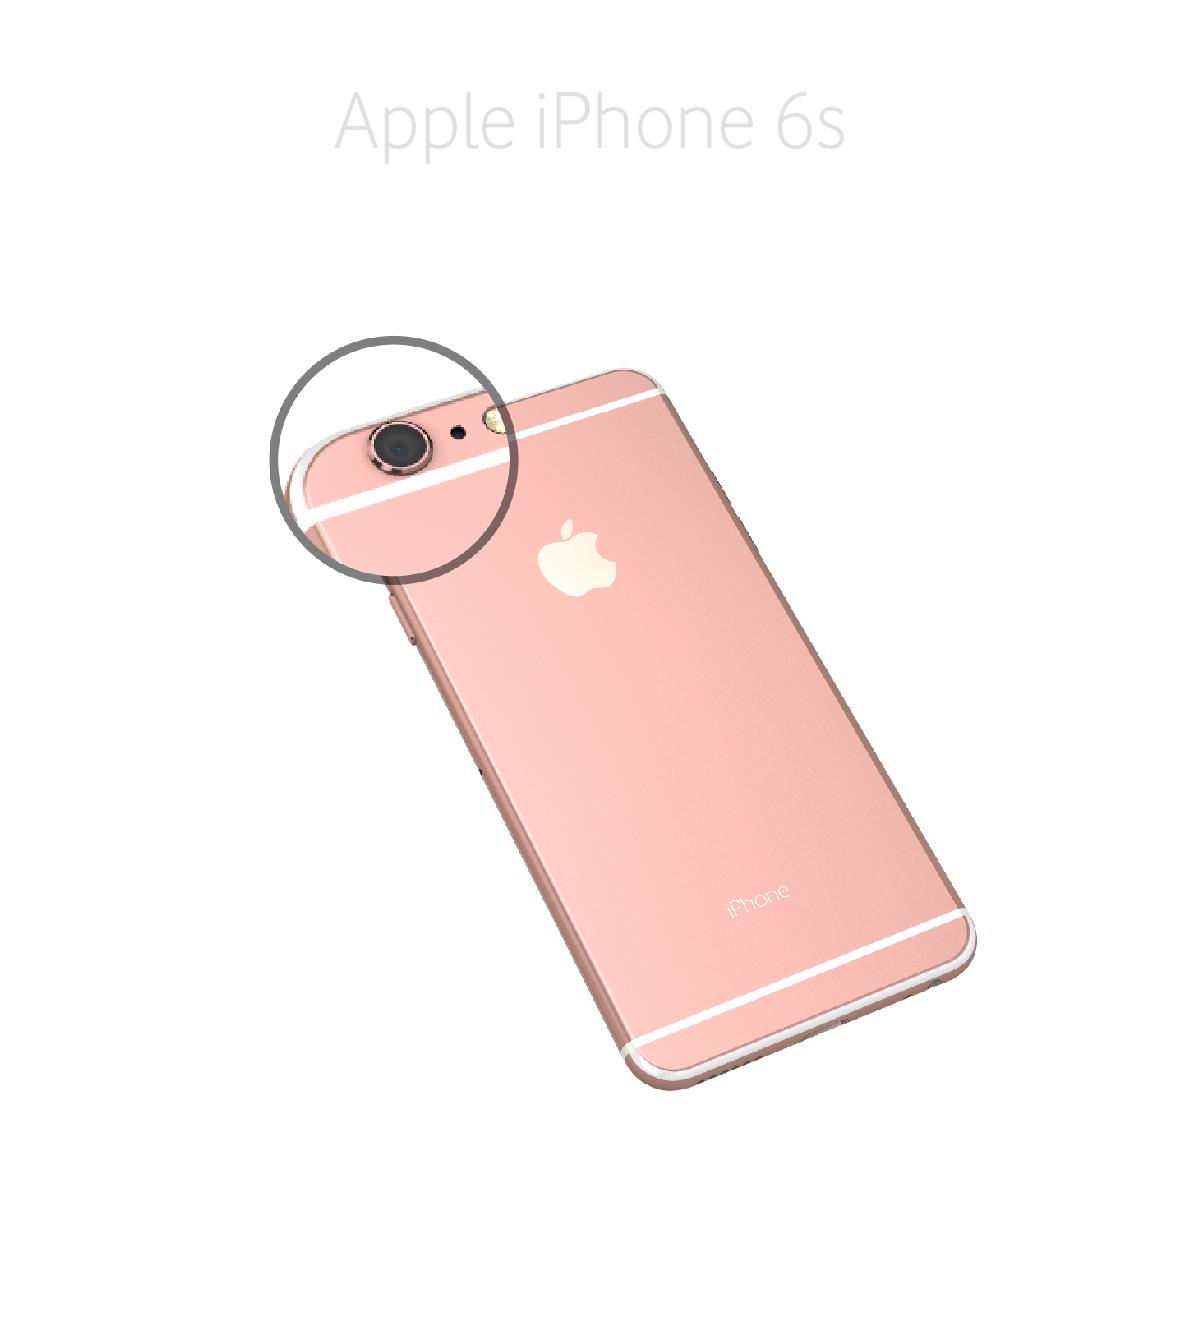 Laga kamera iPhone 6s